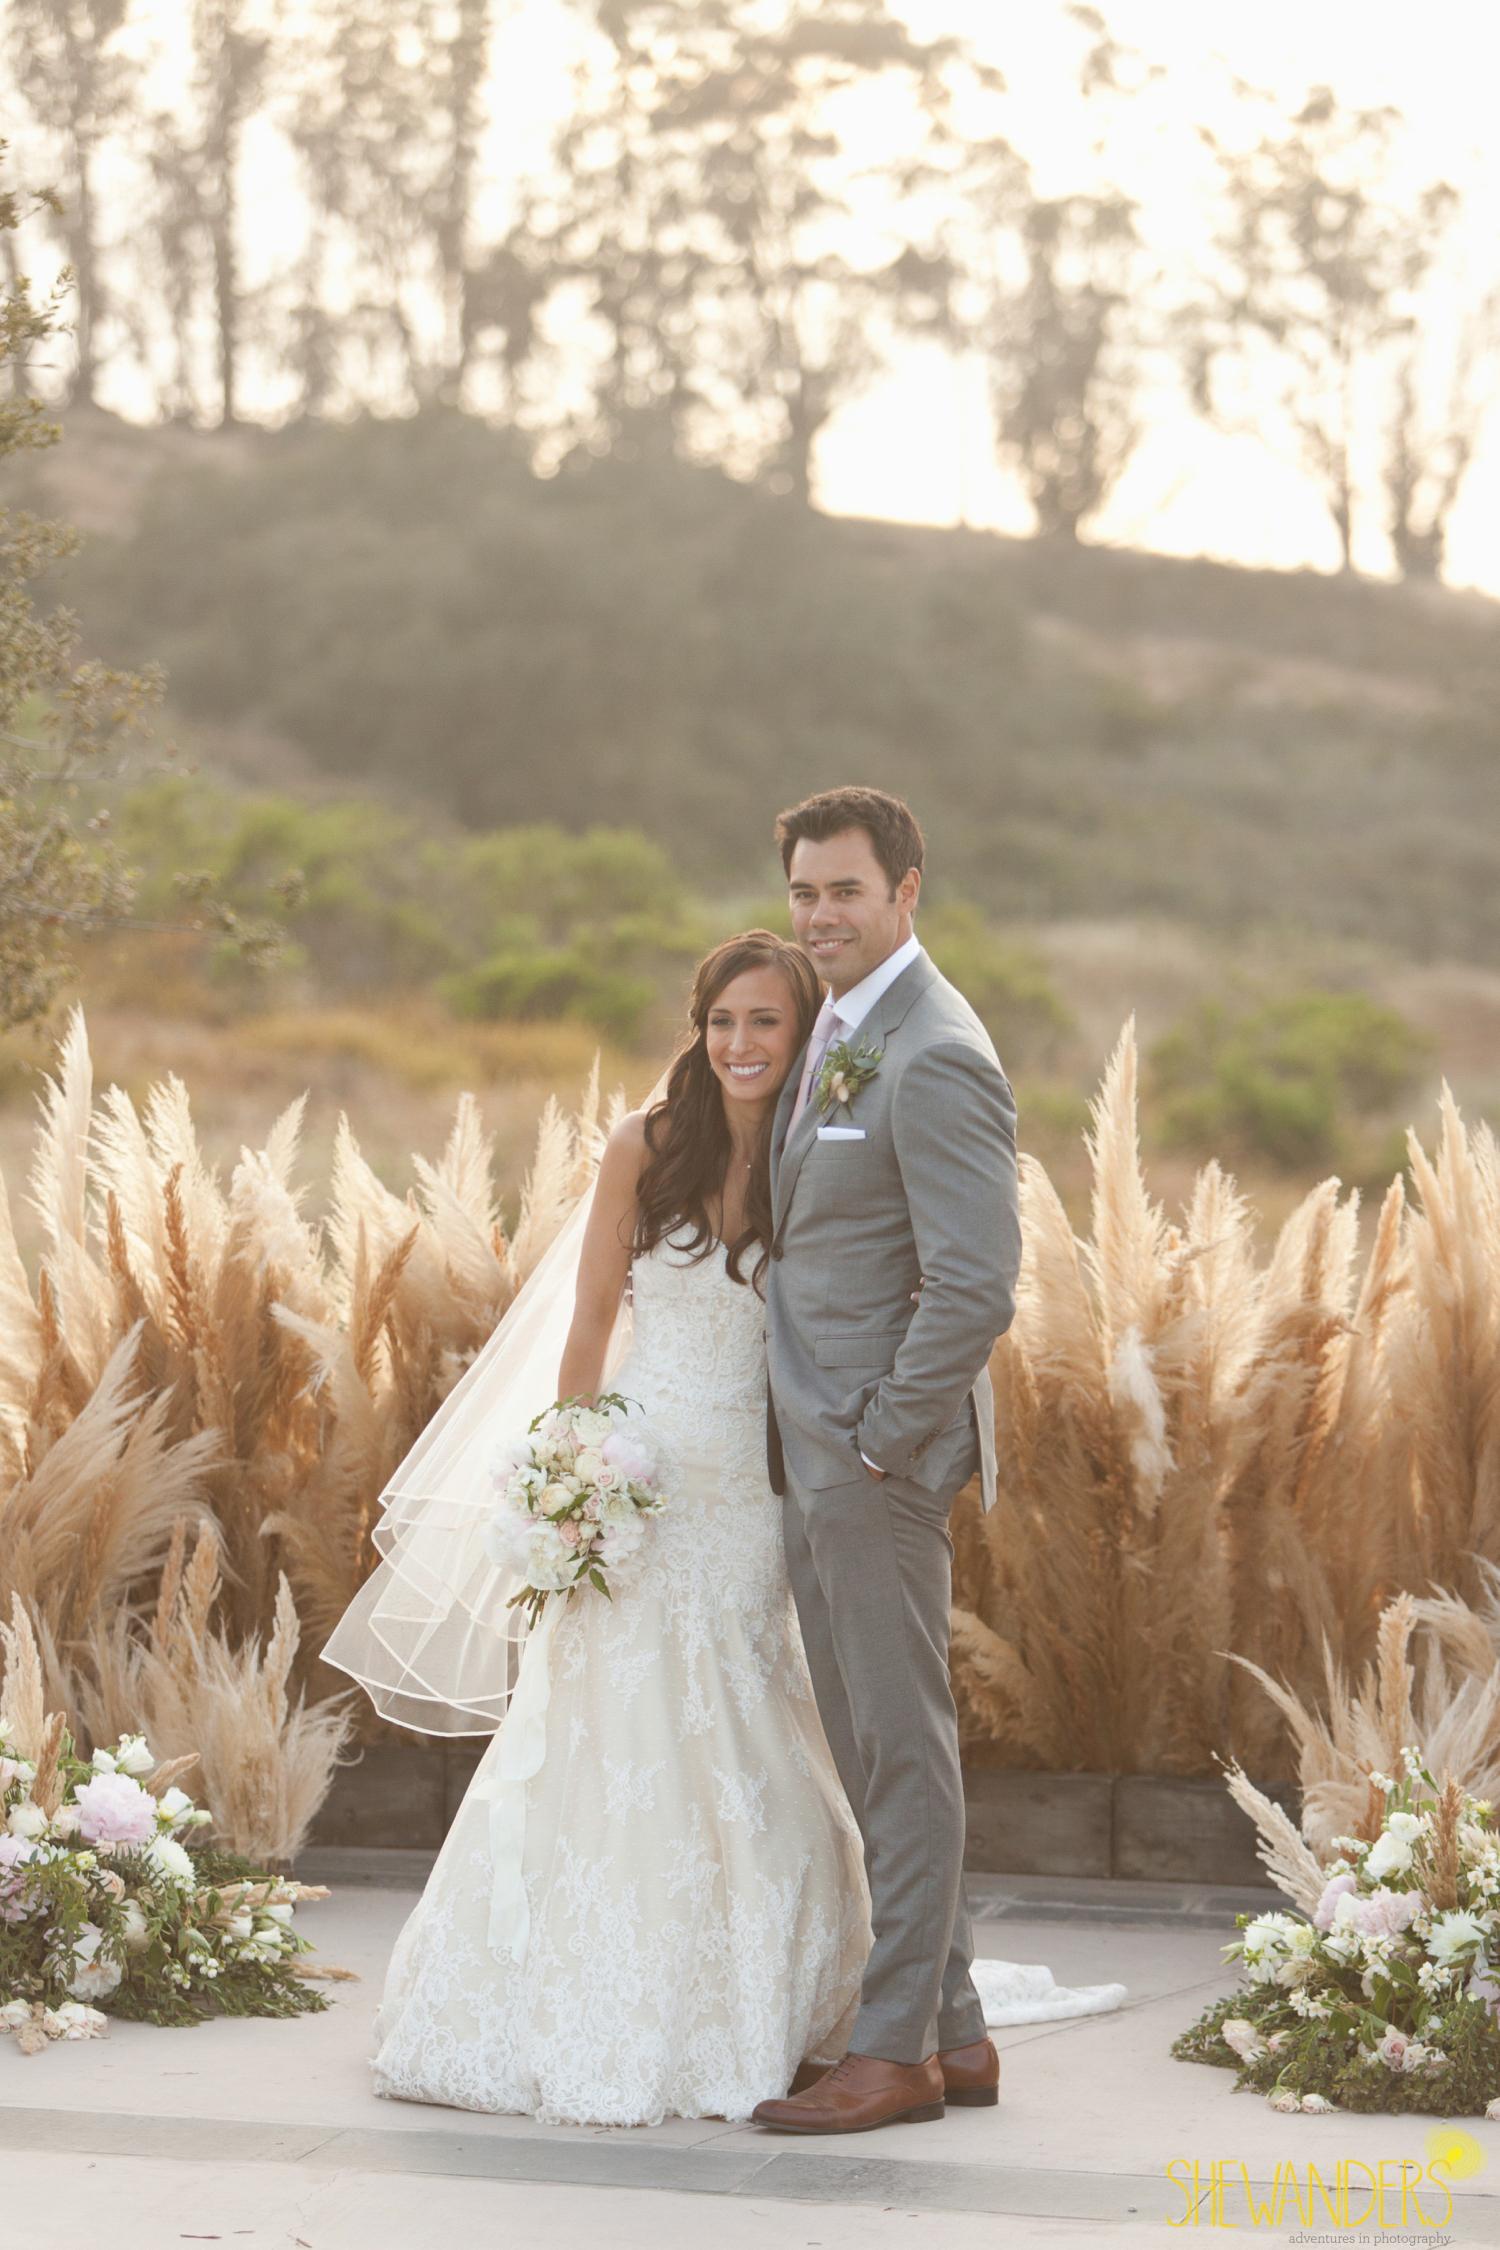 1068.Shewanders.TammiWalter.Wedding.SanDiego_1067.jpg.TammiWalter.Wedding.SanDiego_1067.jpg